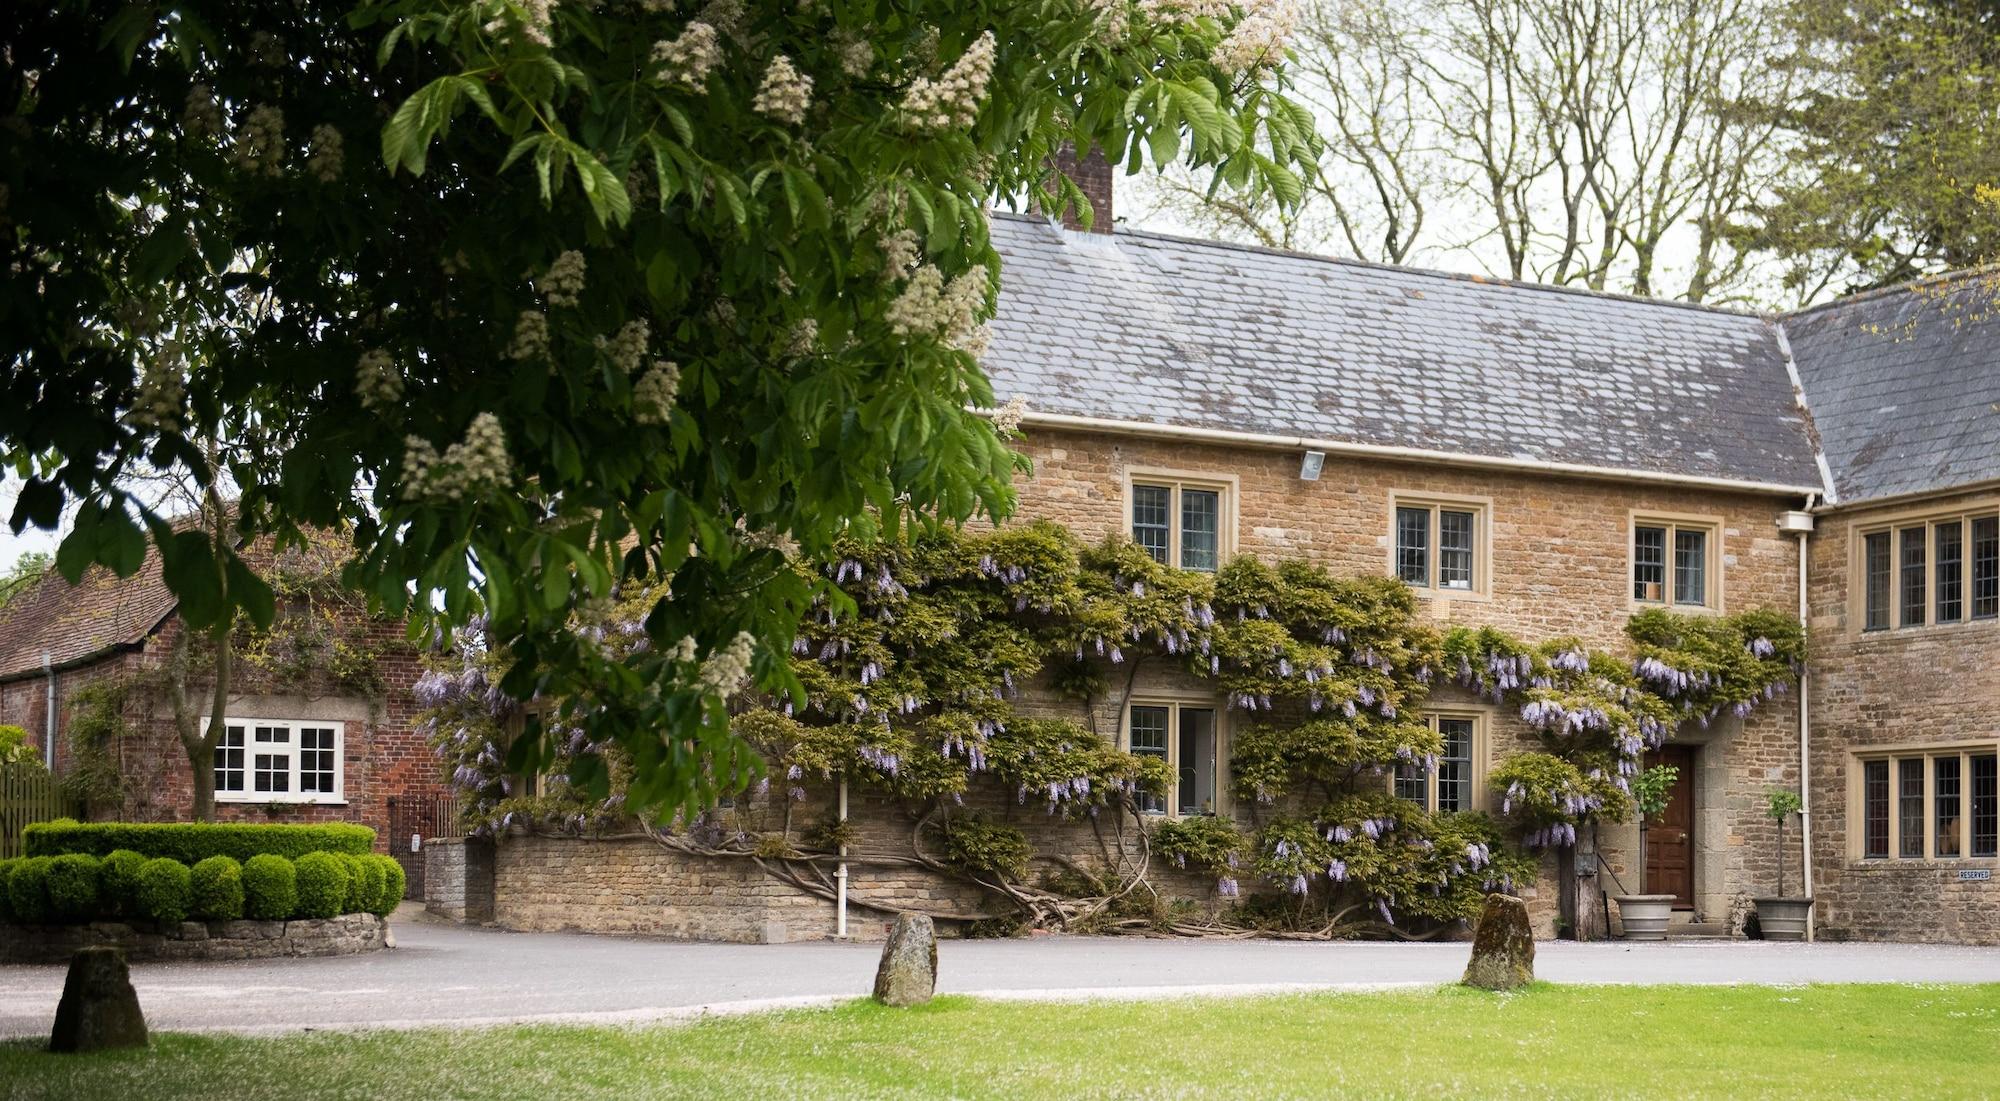 Plumber Manor, Dorset